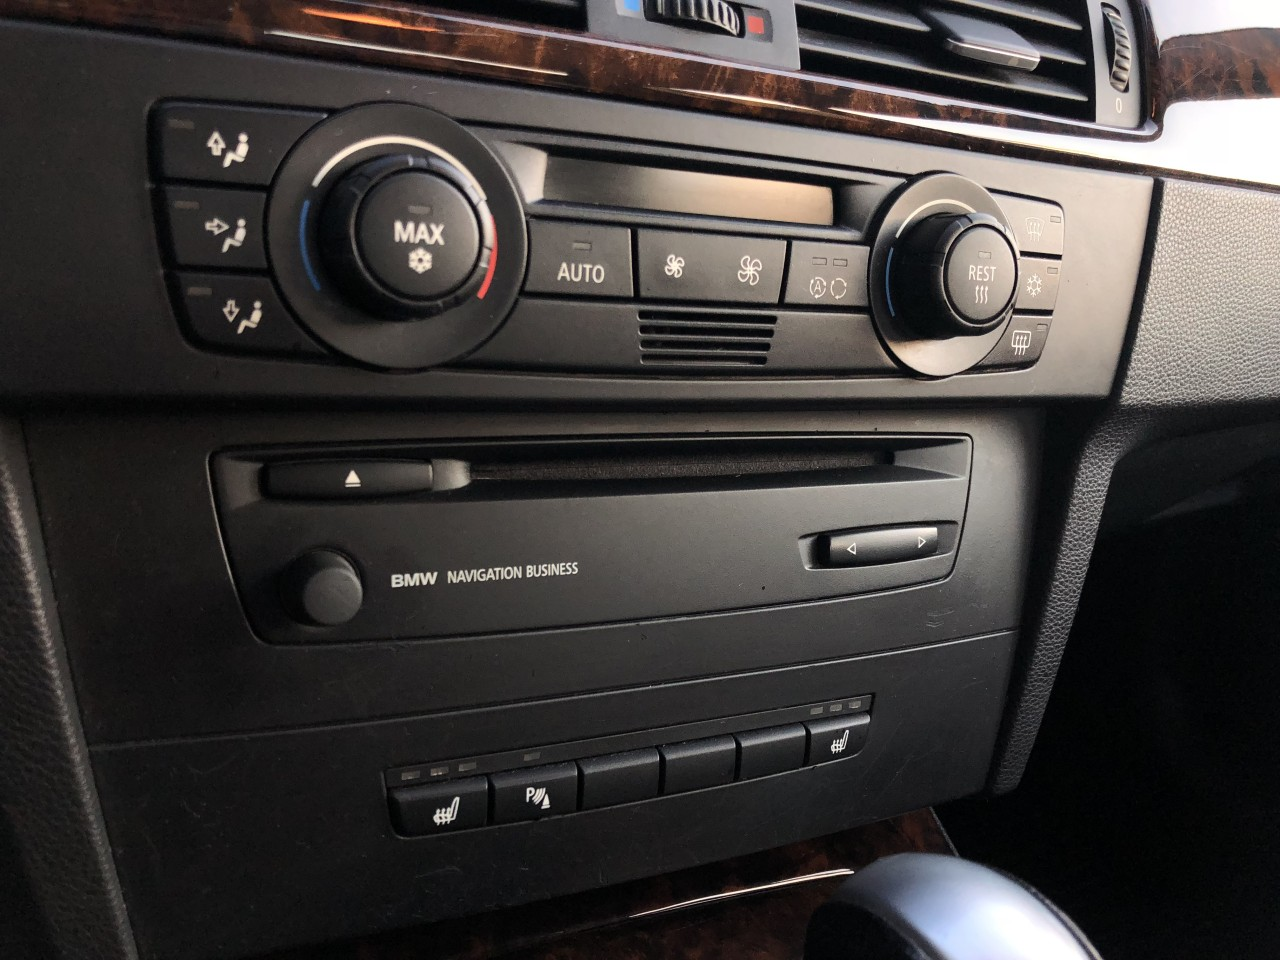 BMW 320 BMW 320d 163Cp Automata / Navigatie / Xenon / Senzori parcare fata+spate/ Scaune incalzite etc.. RECENT ADUSA DIN GERMANIA!!! 2006